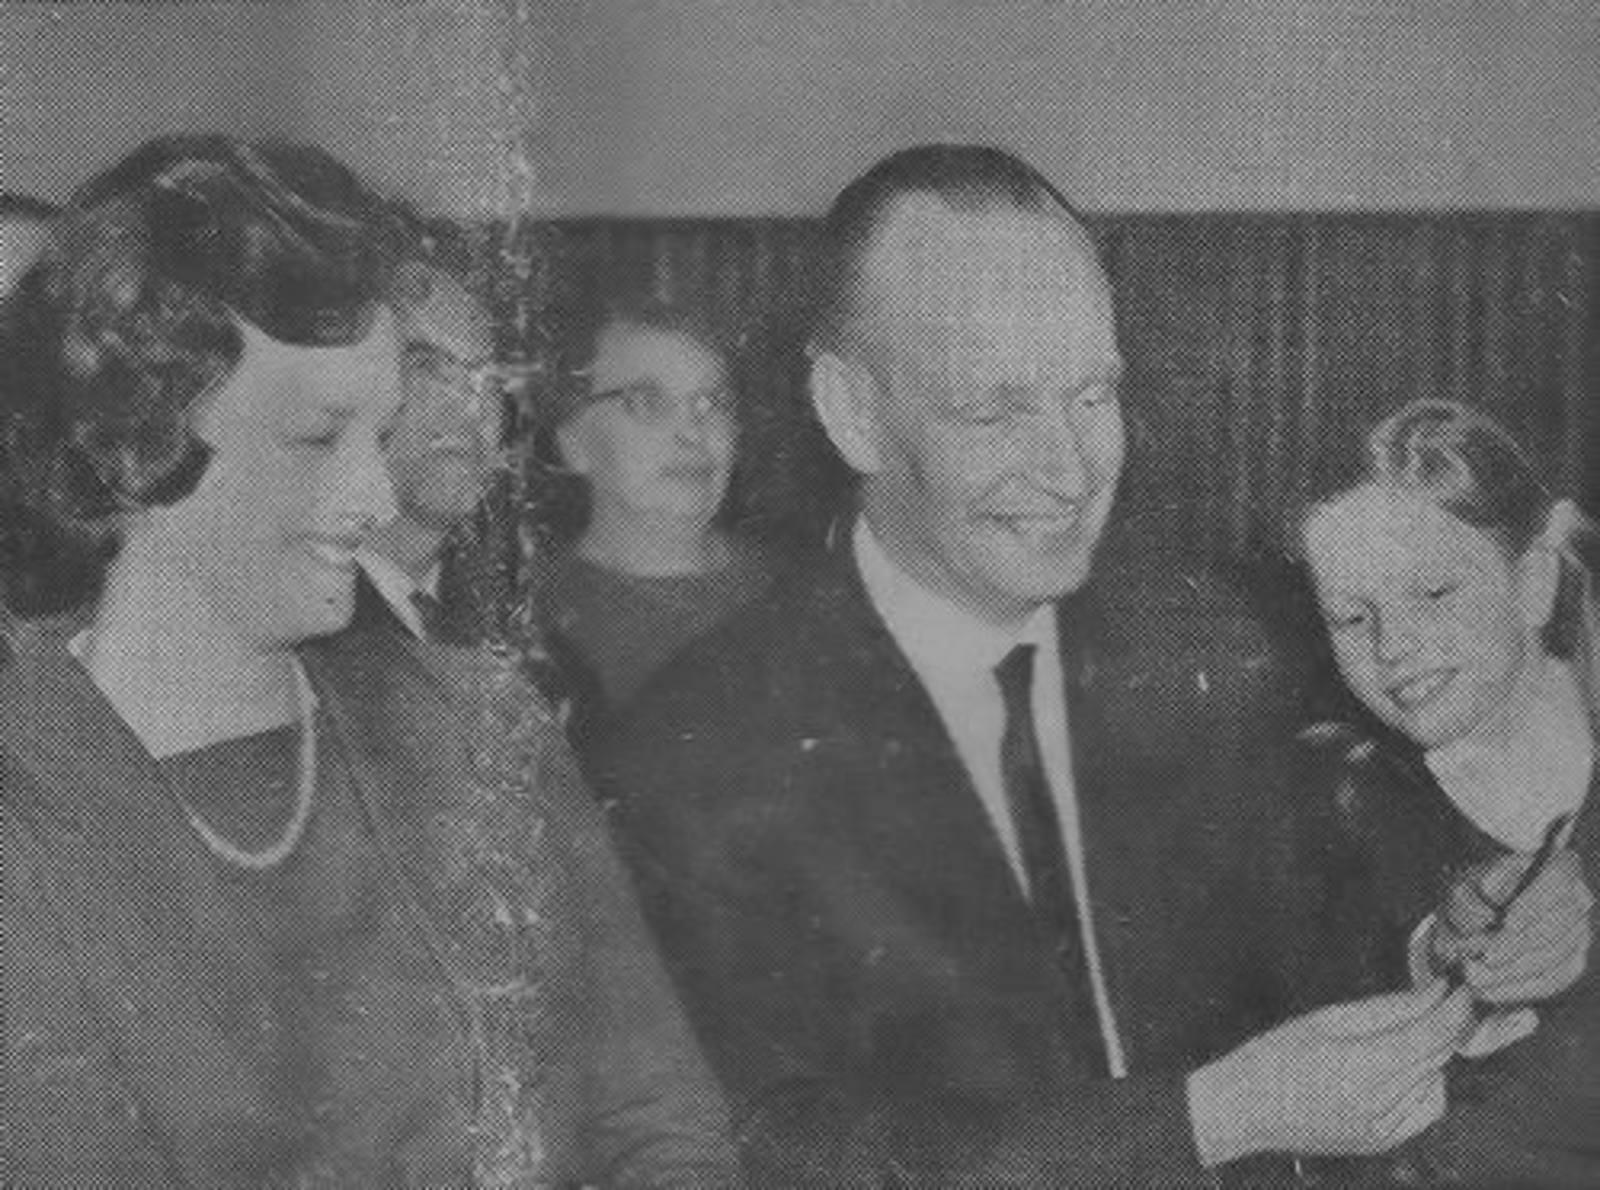 Bult Jan 1963 Huisarts neemt afscheid